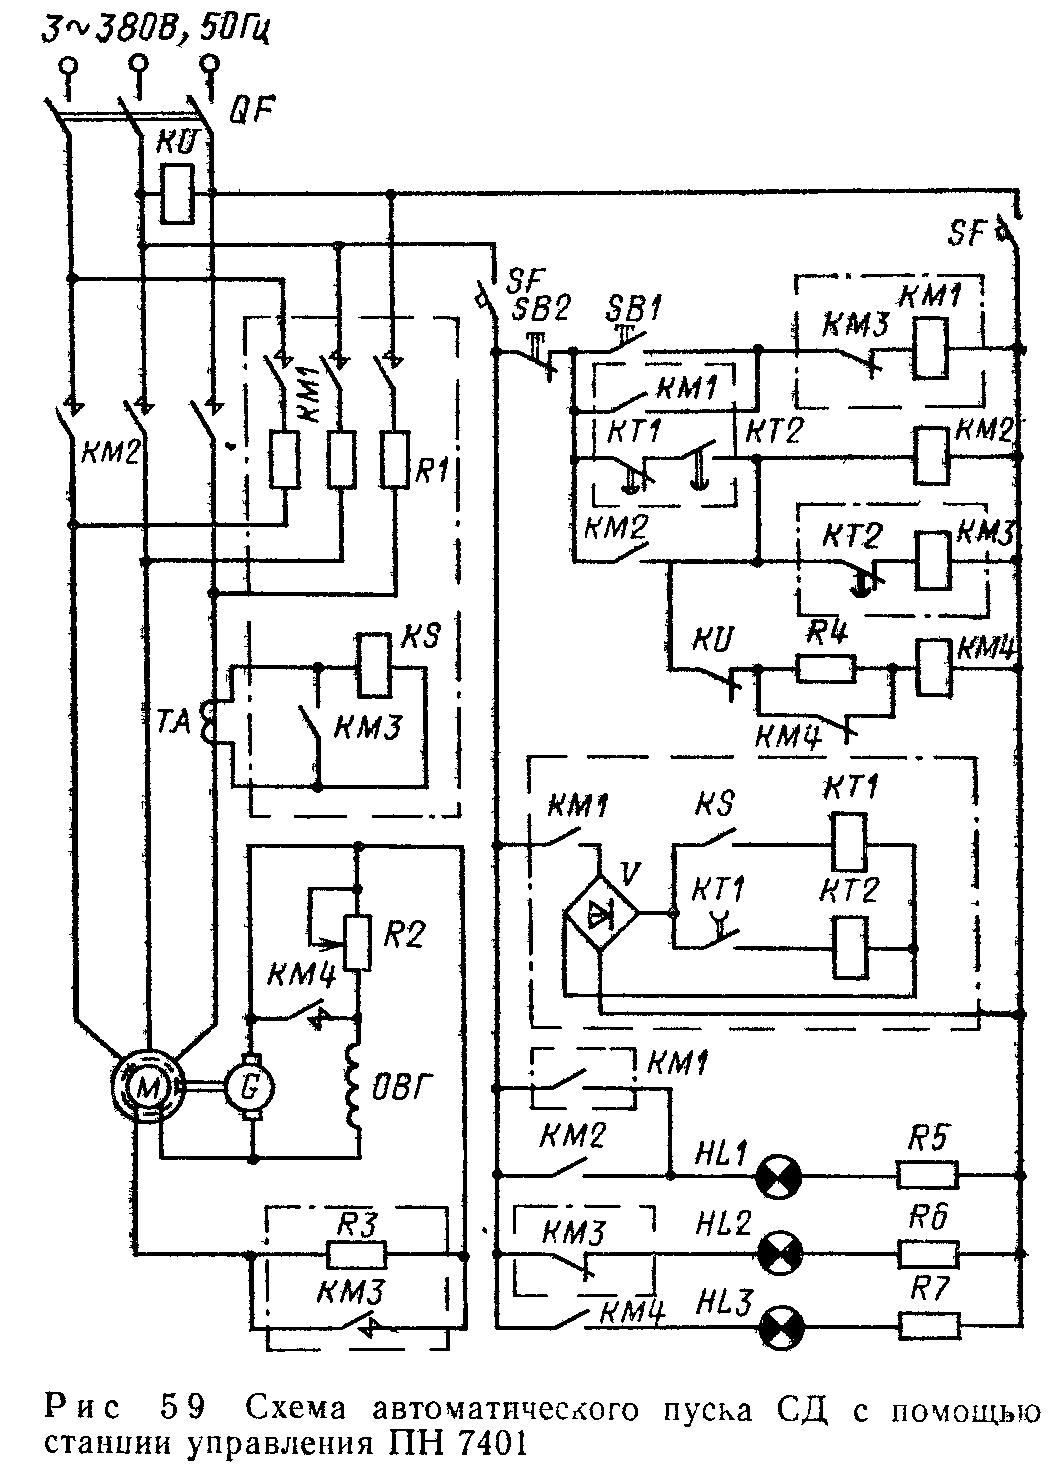 схема прямого включения p-n